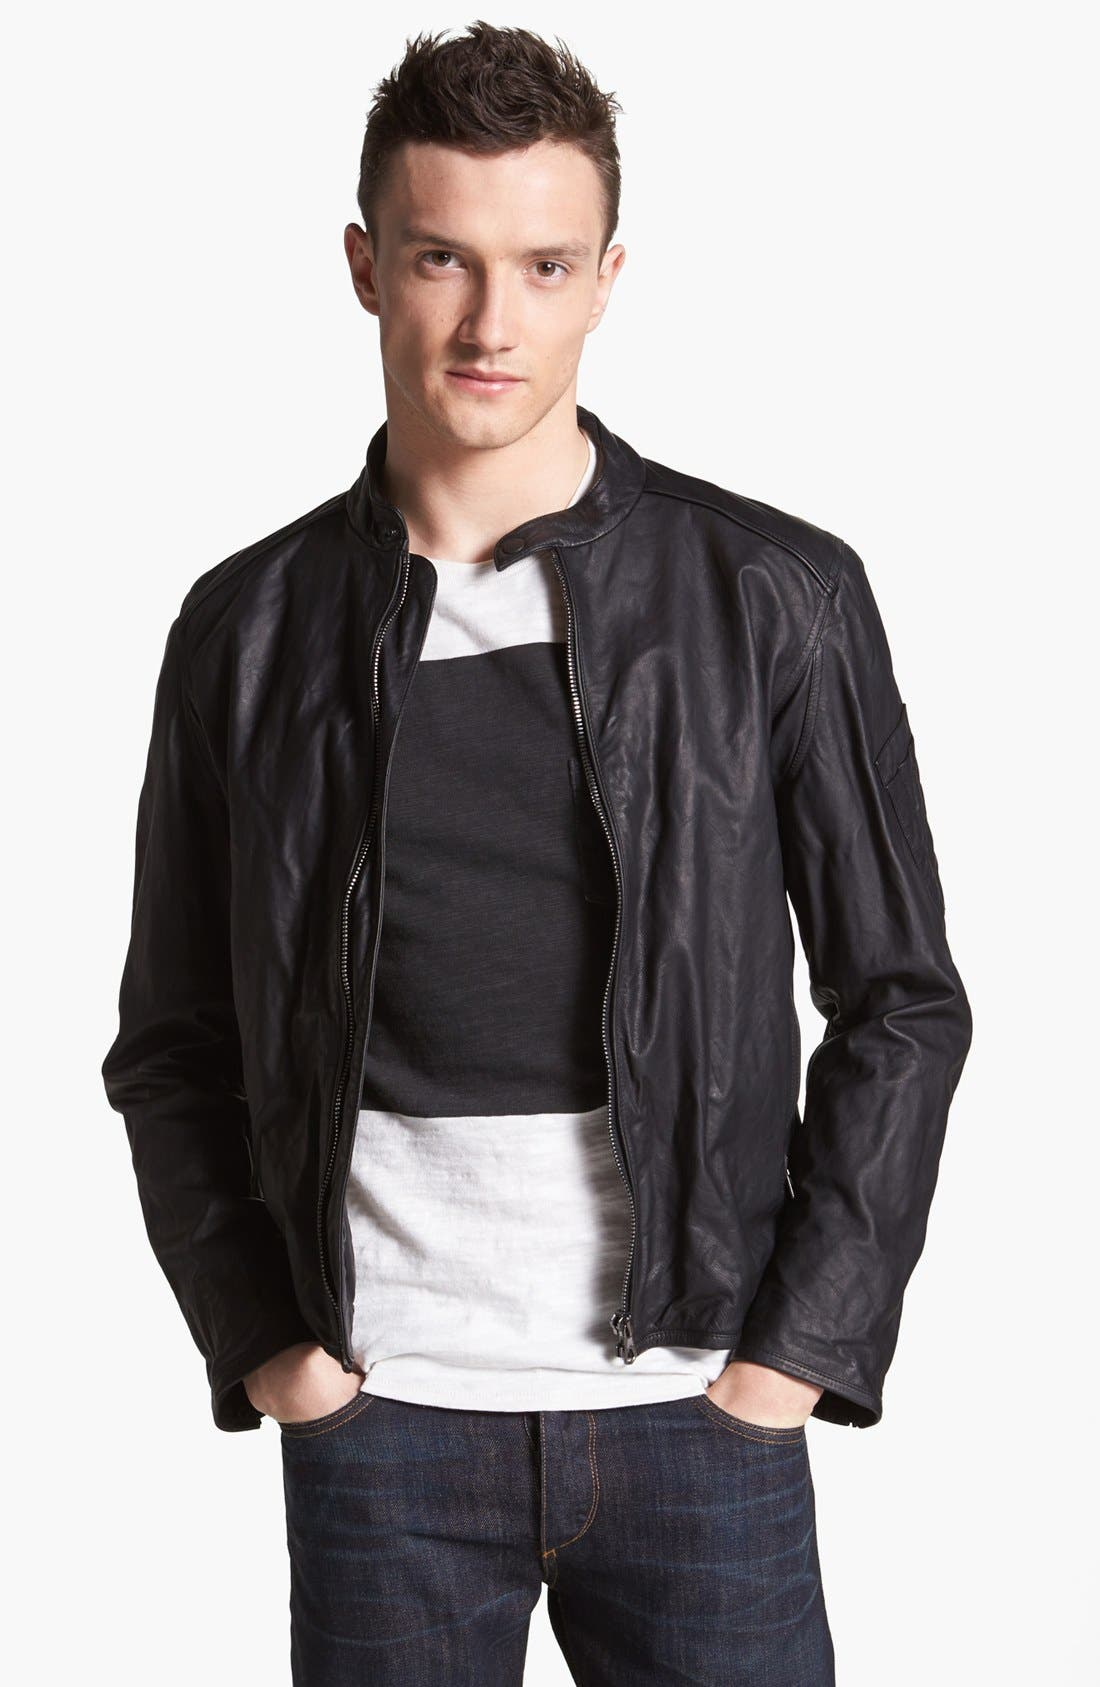 Alternate Image 1 Selected - rag & bone 'Macclesfield' Kangaroo Leather Jacket